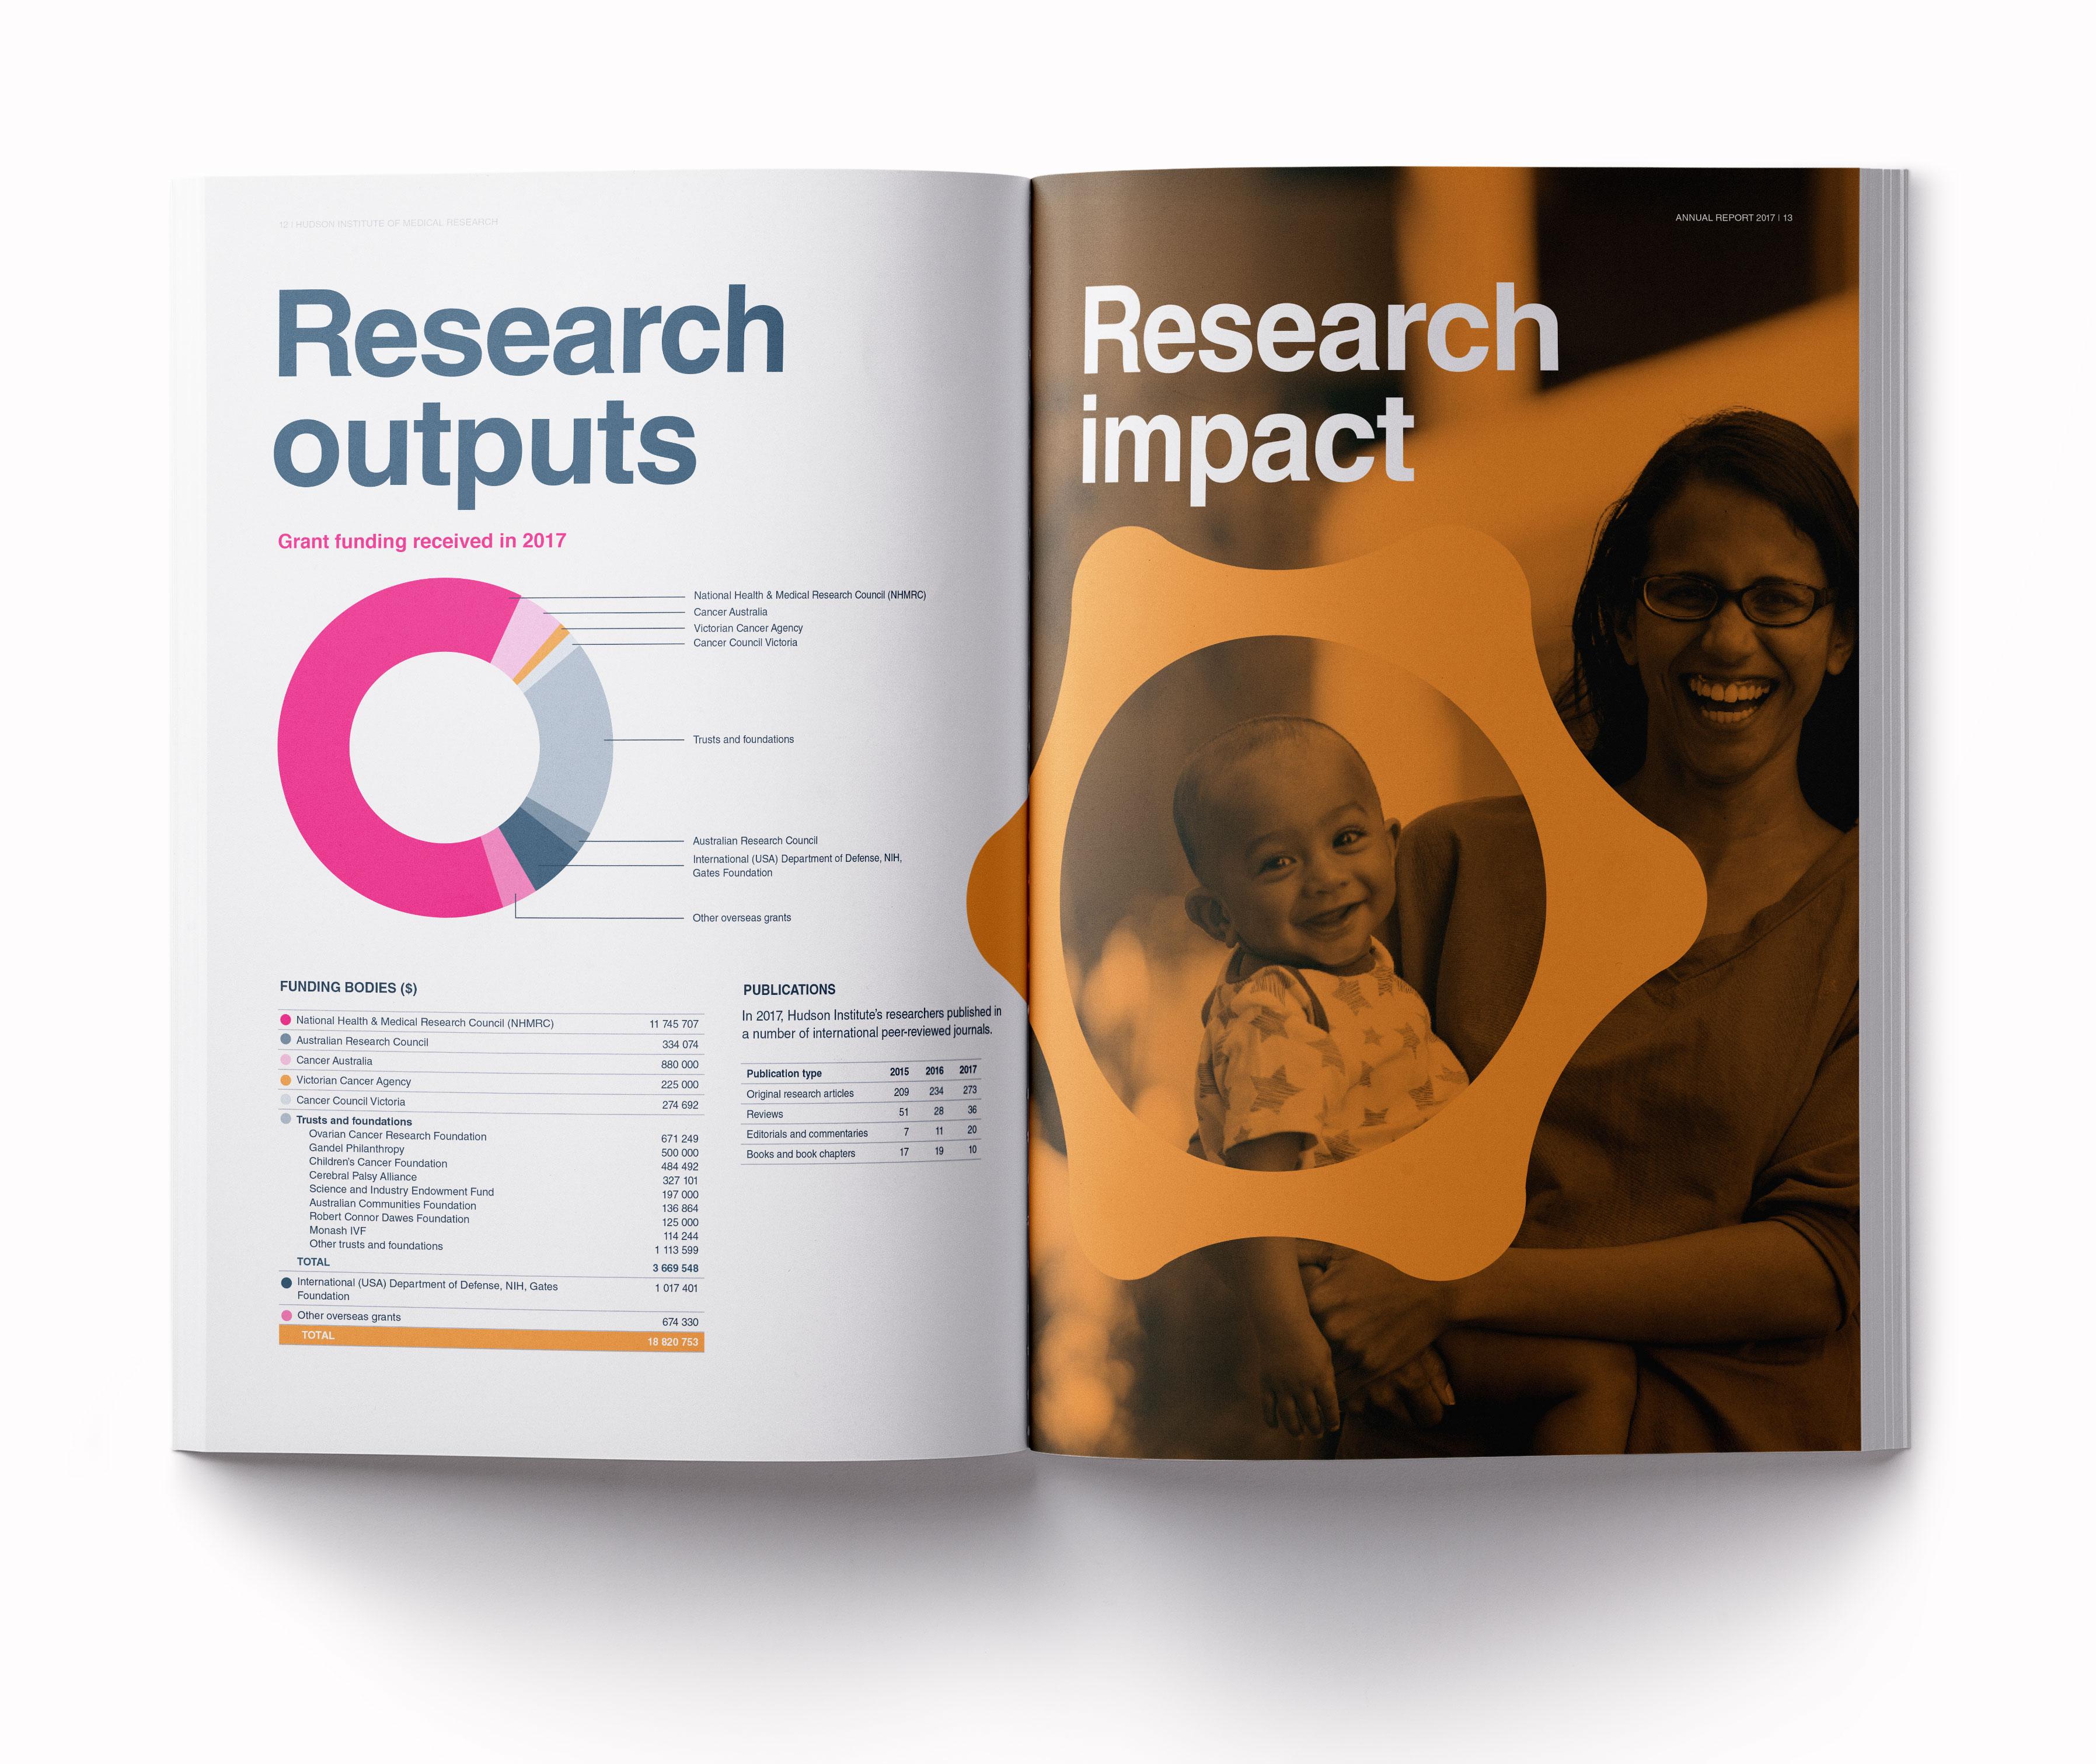 Hudson Institure annual report spread